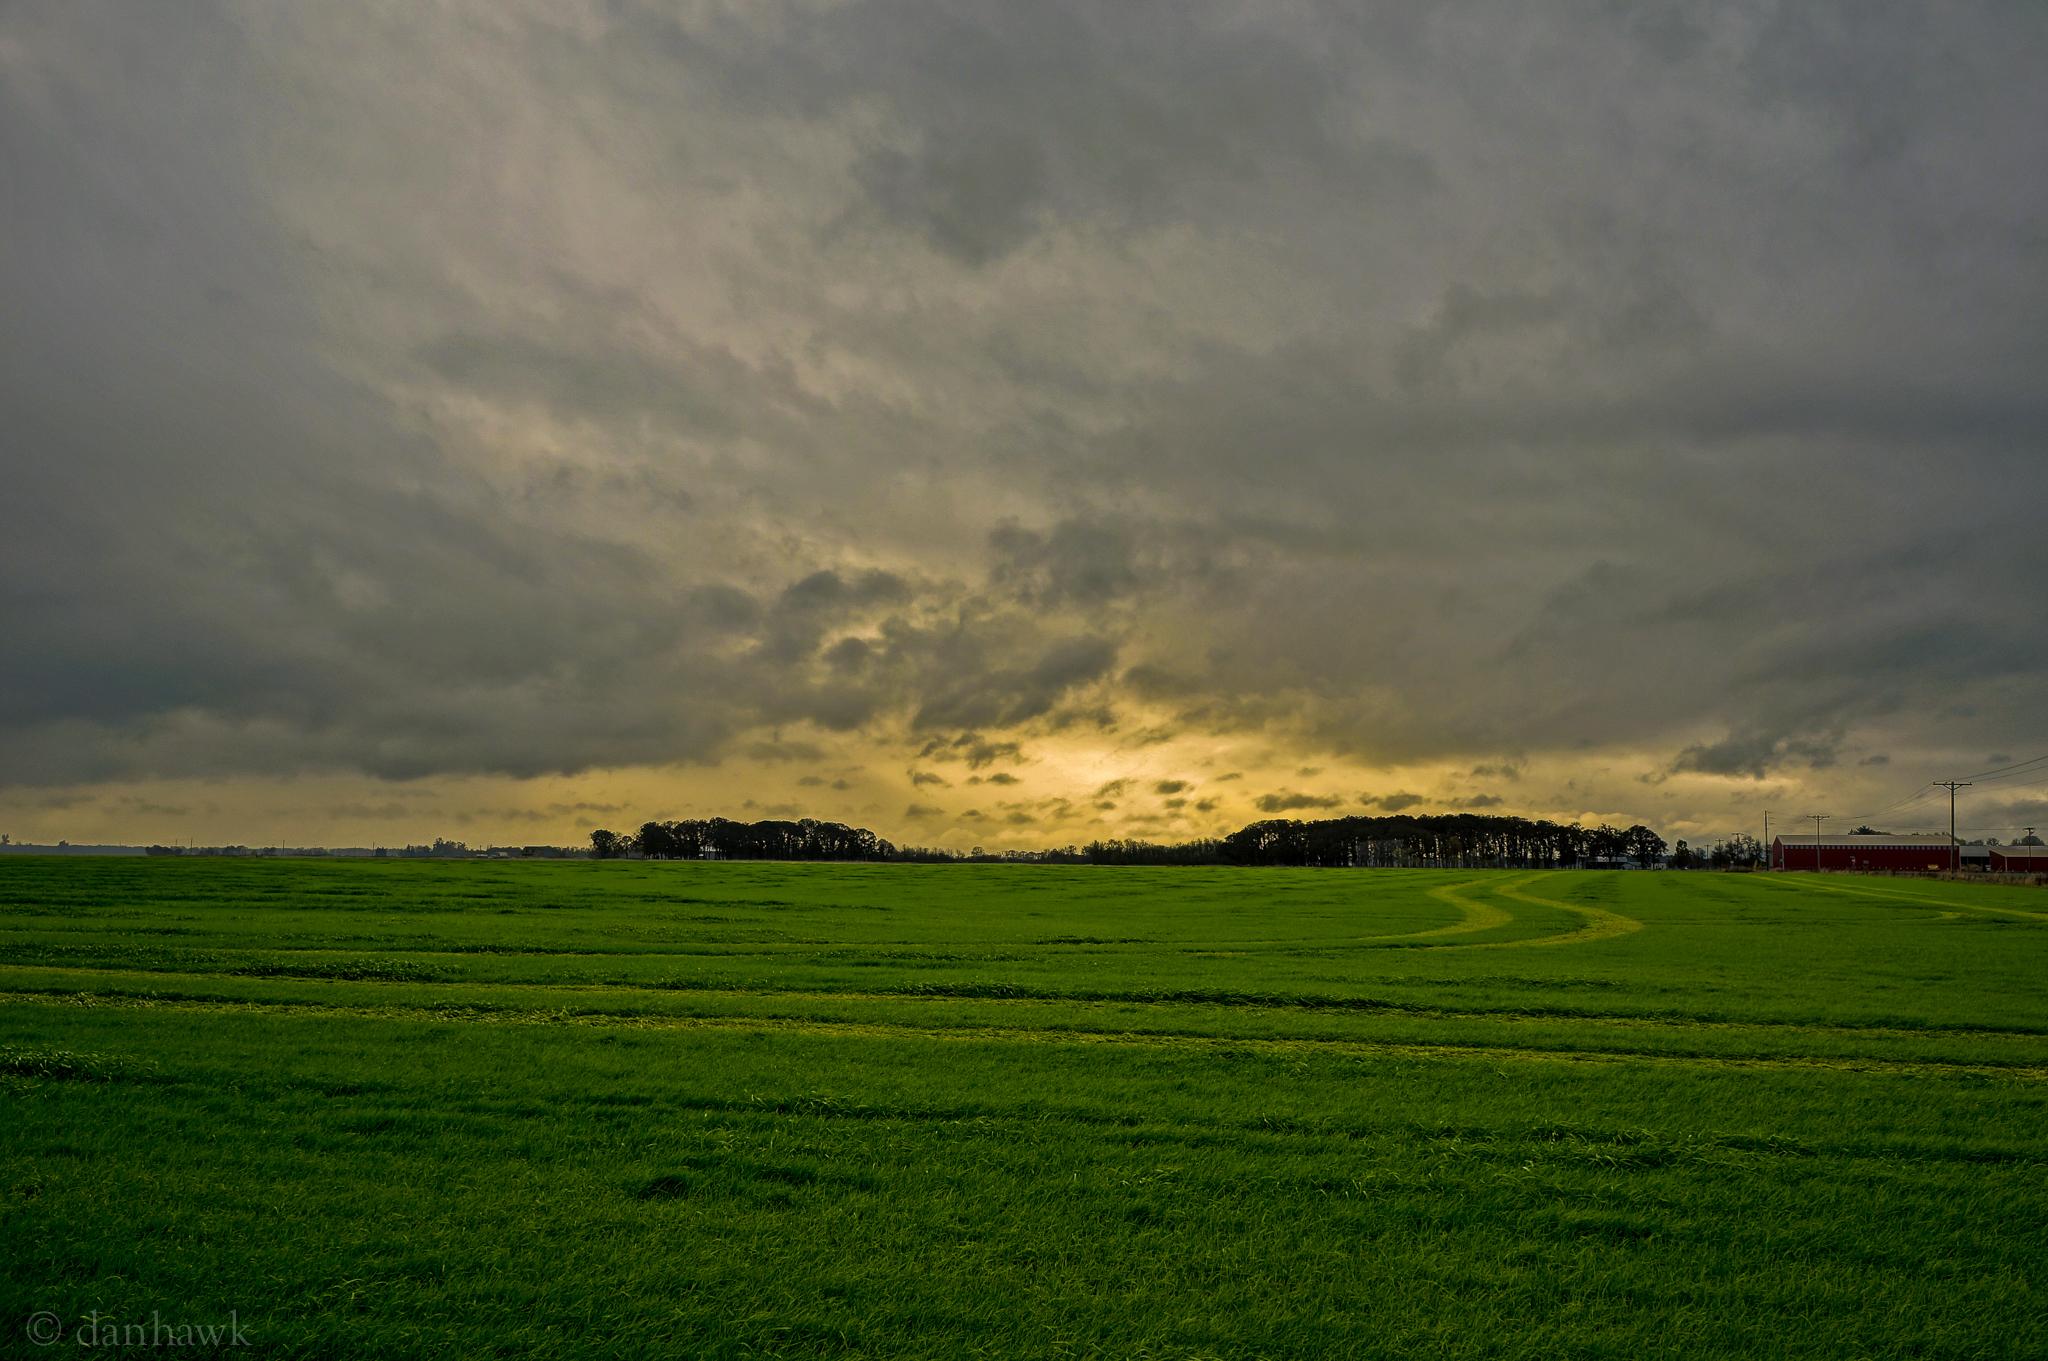 Farming | 365 Project | Nov 12th, 2012